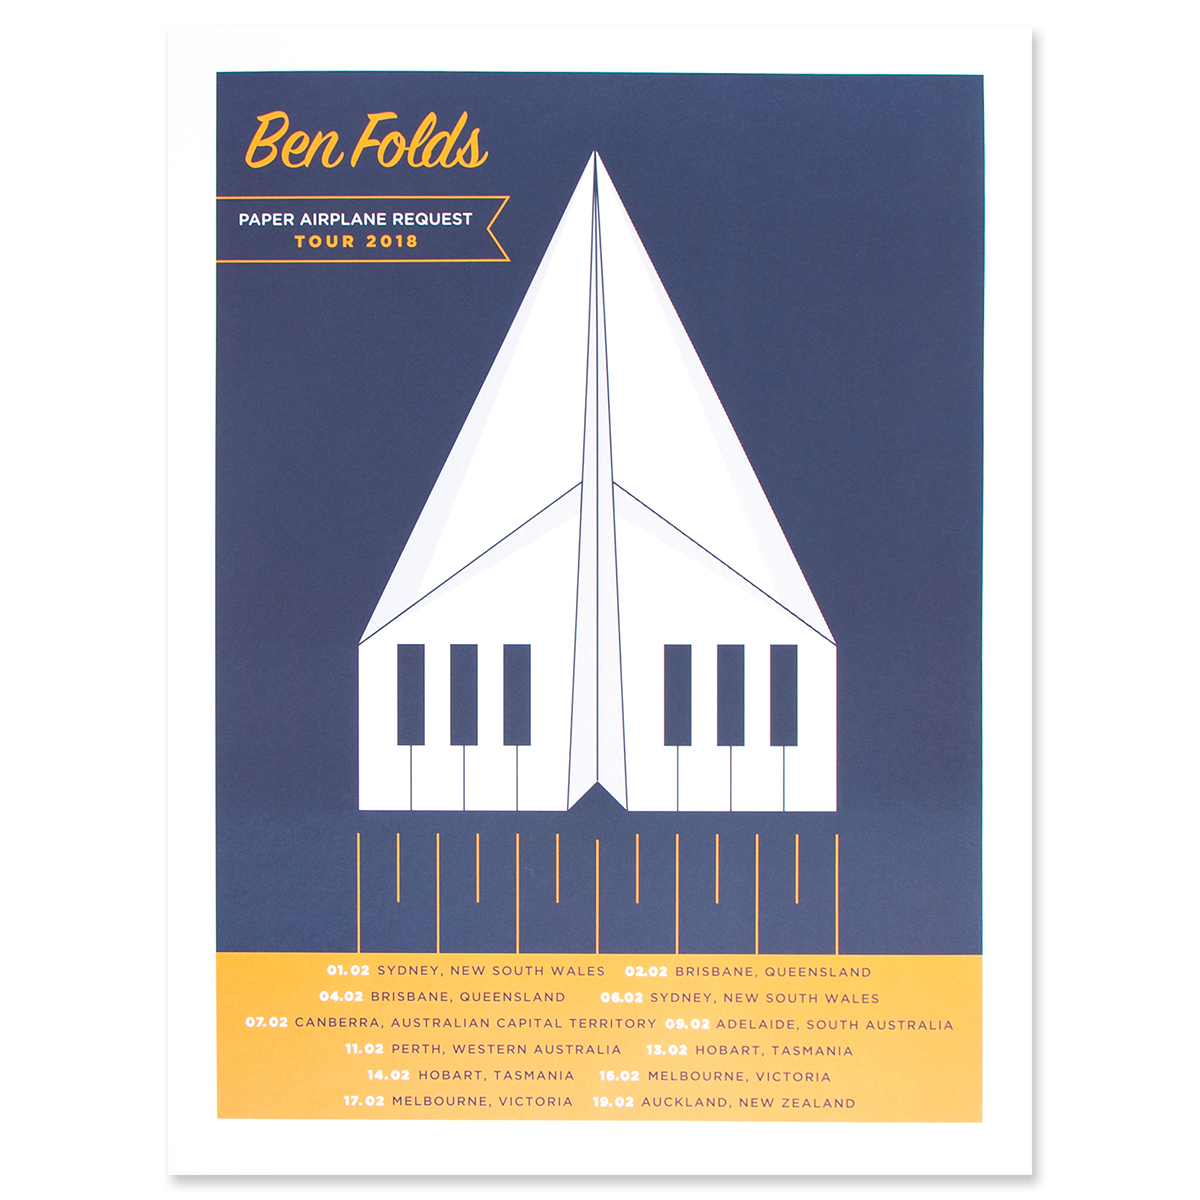 Paper Airplane 2018 Australian Tour Poster